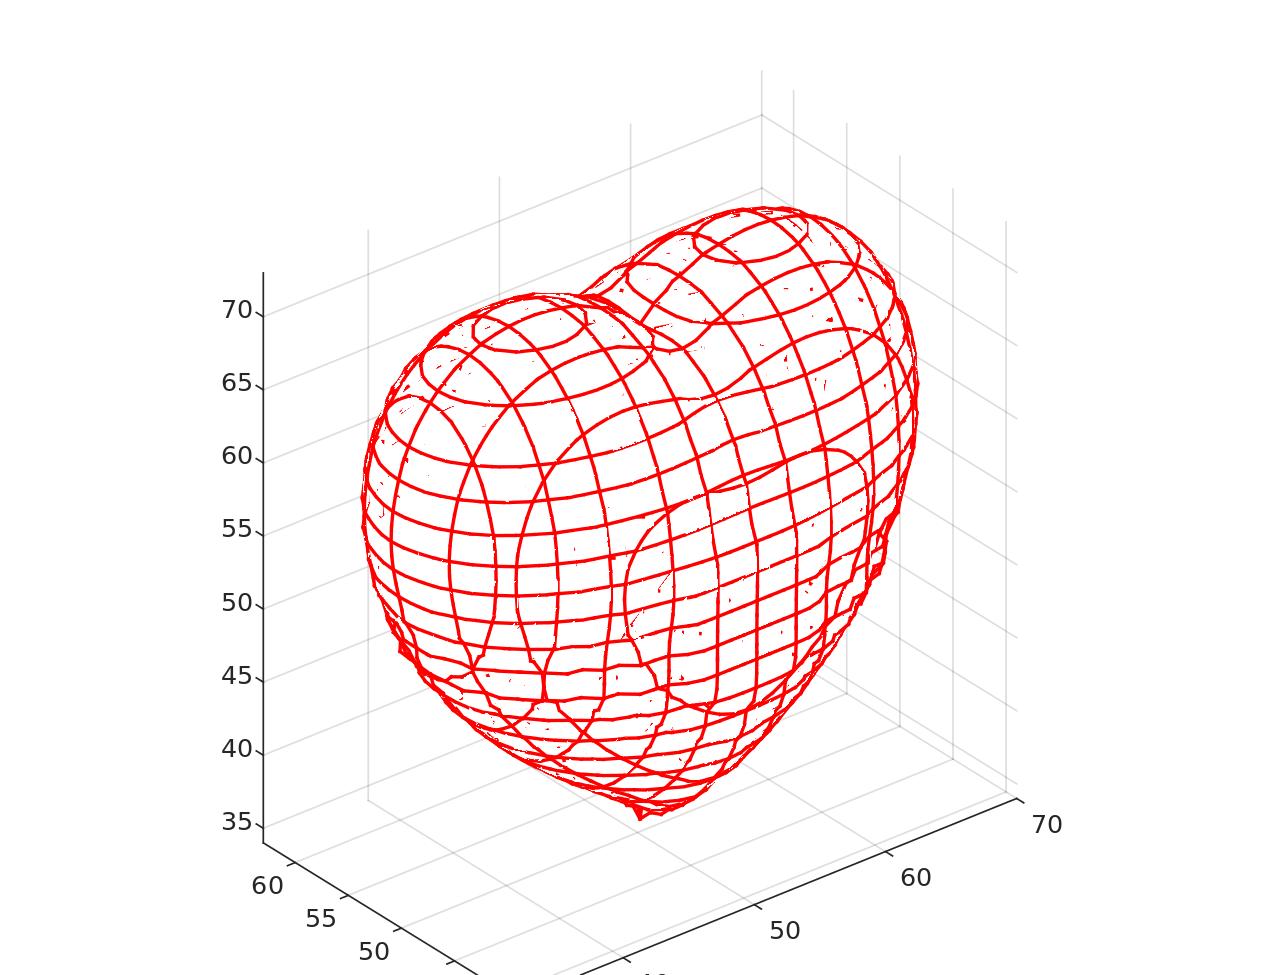 https://commons.wikimedia.org/wiki/File:Heart-Drawn_Using_MATLAB.svg